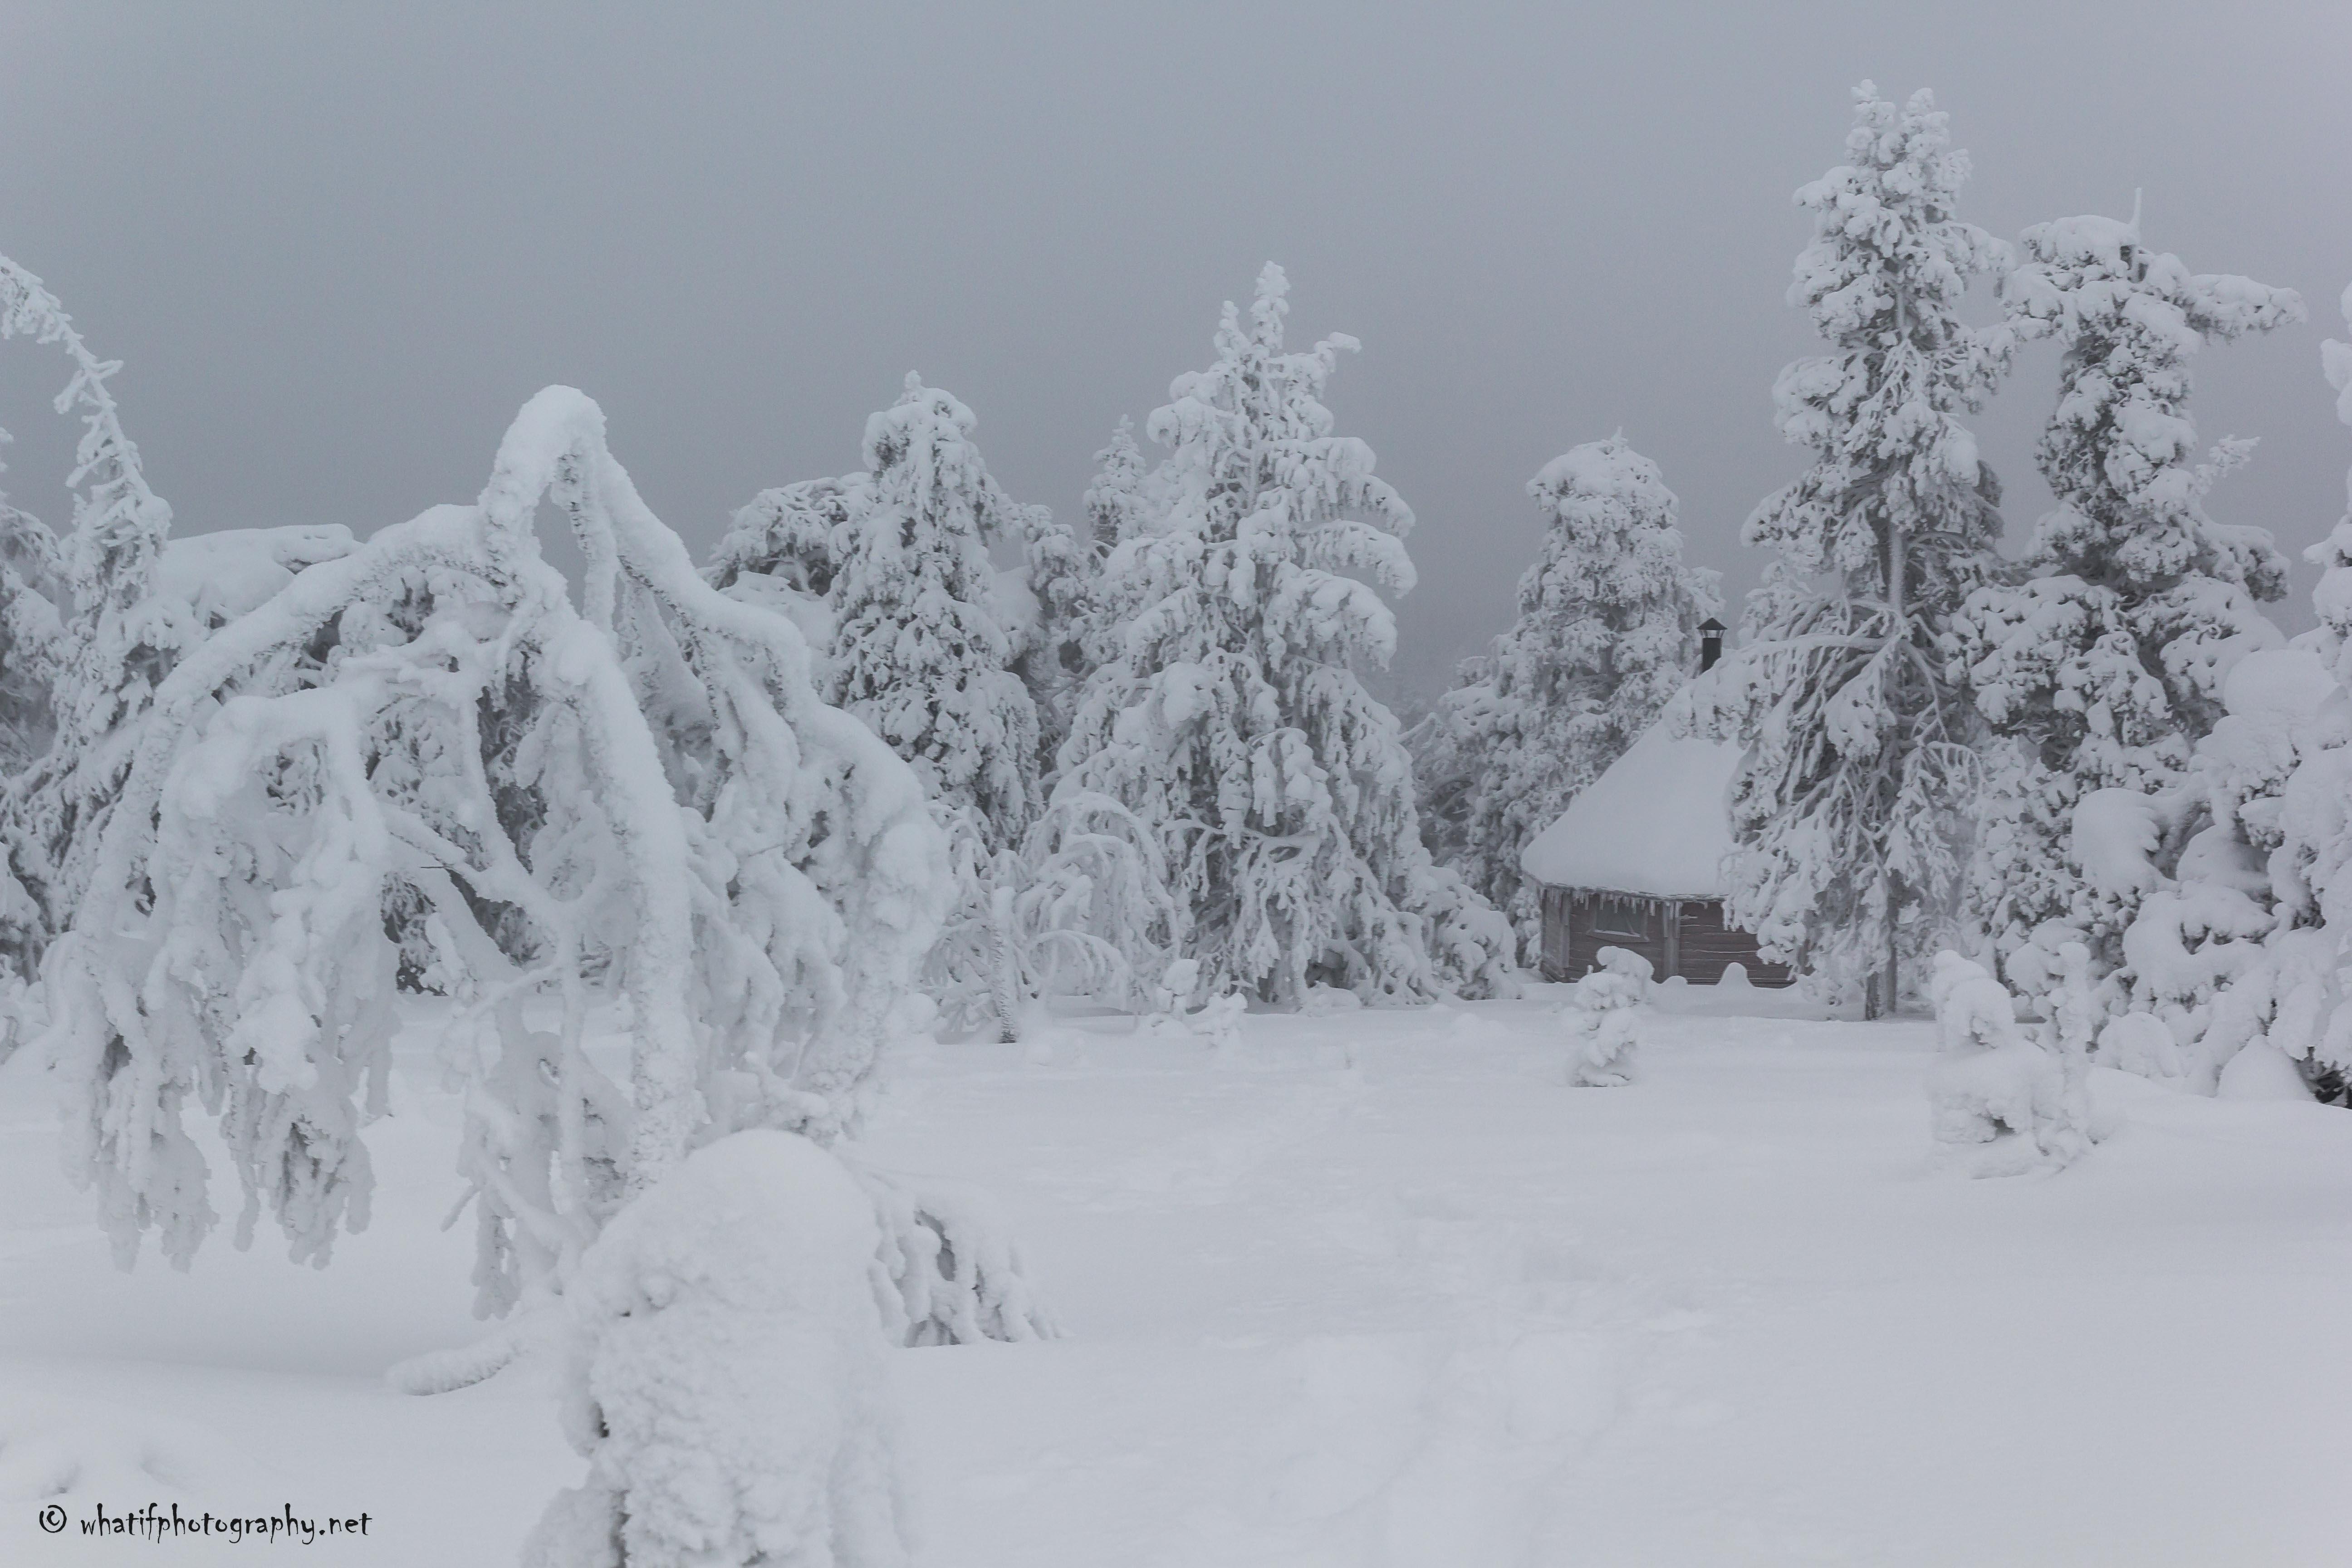 Chalet hidden in the snow